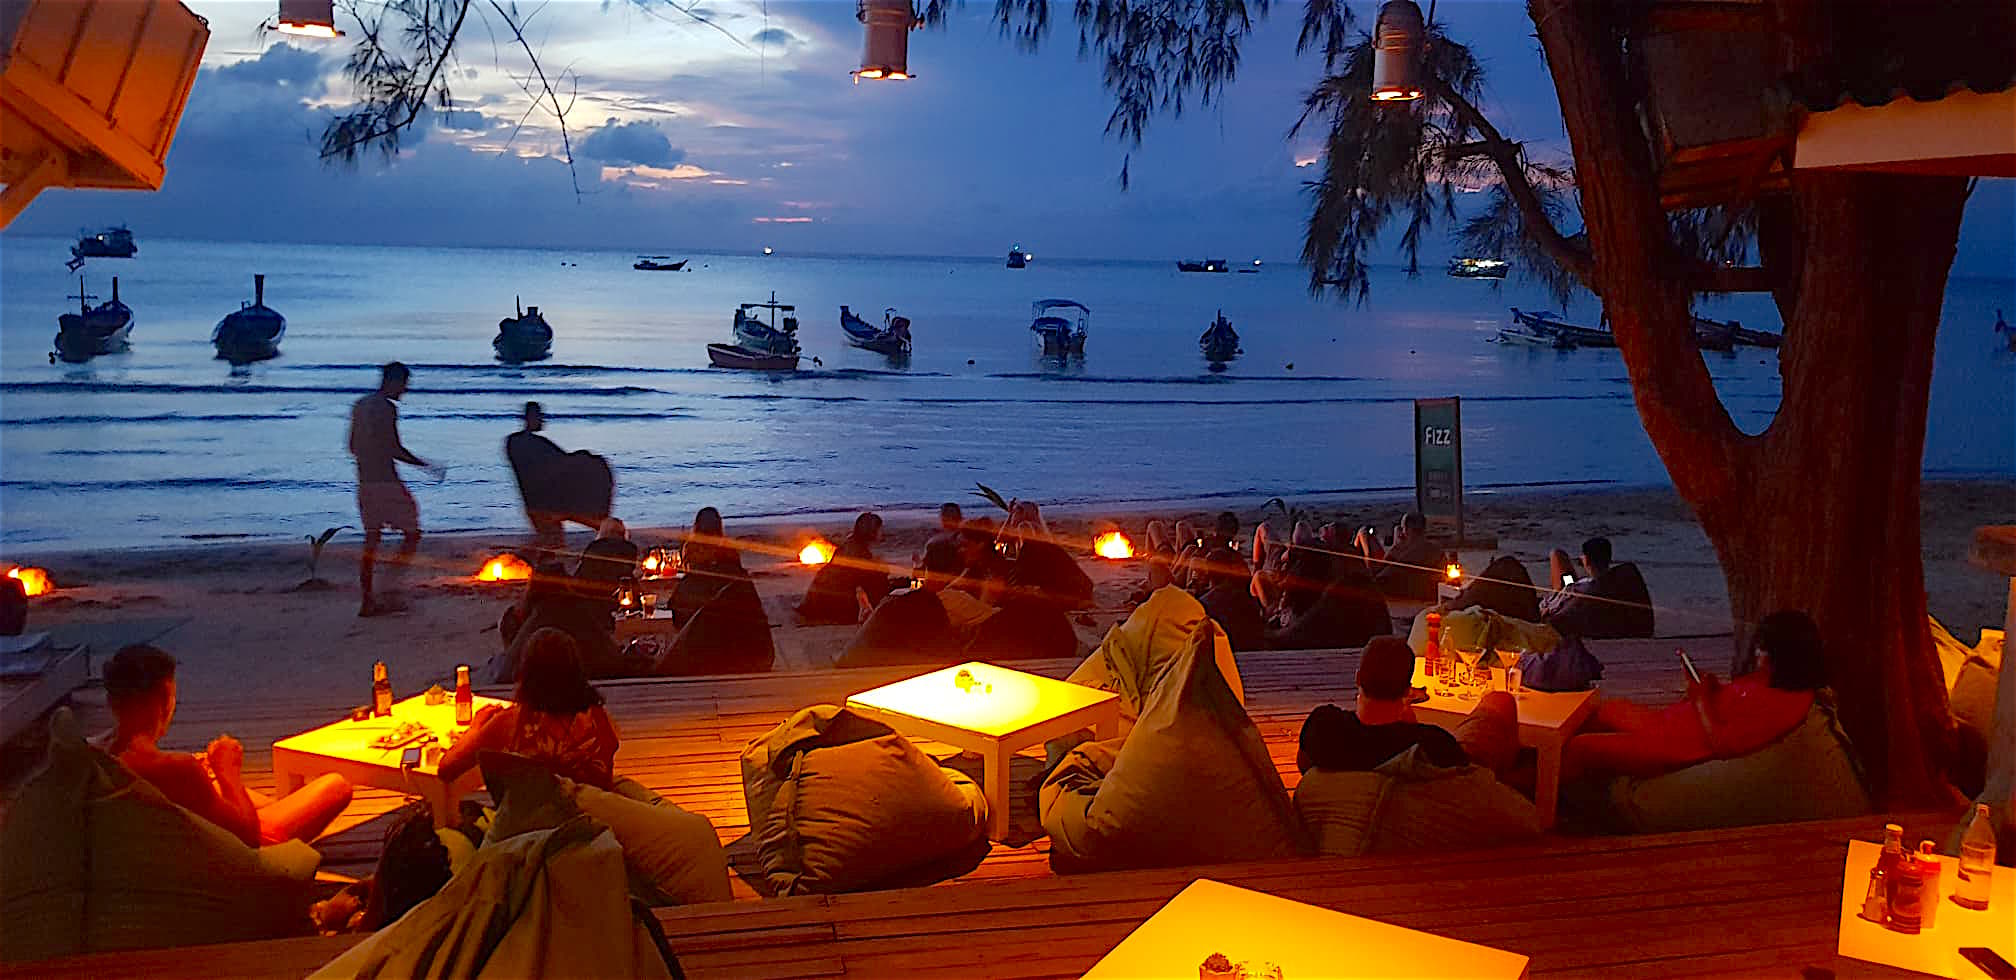 www.thefunkyturtle.com fizz beach lounge koh tao sunset lounge